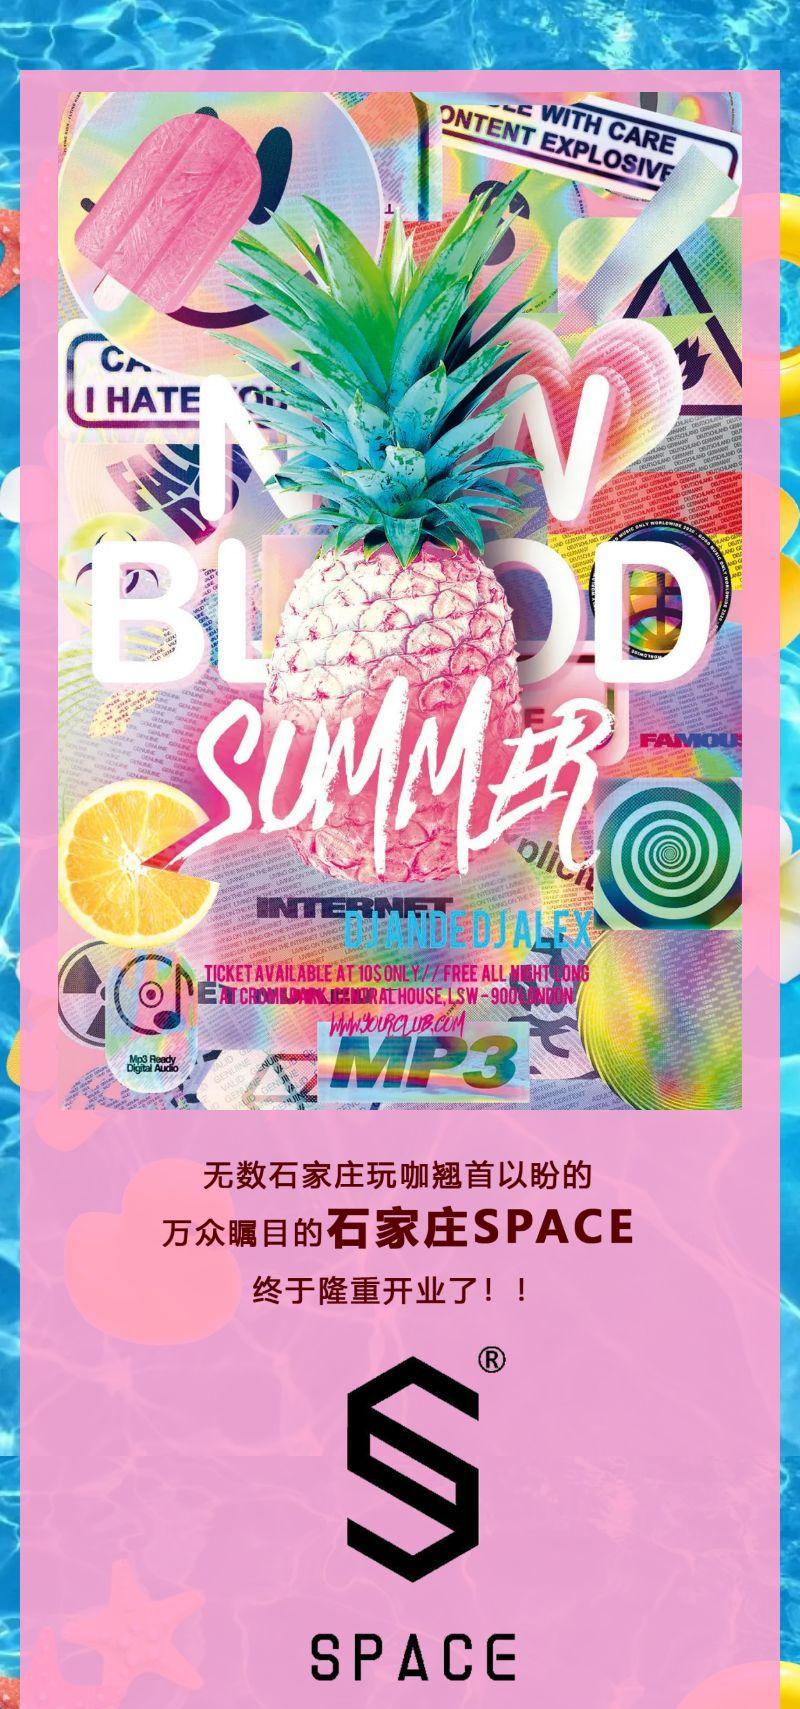 2021NewBlood电音节夏日狂欢主题-石家庄站